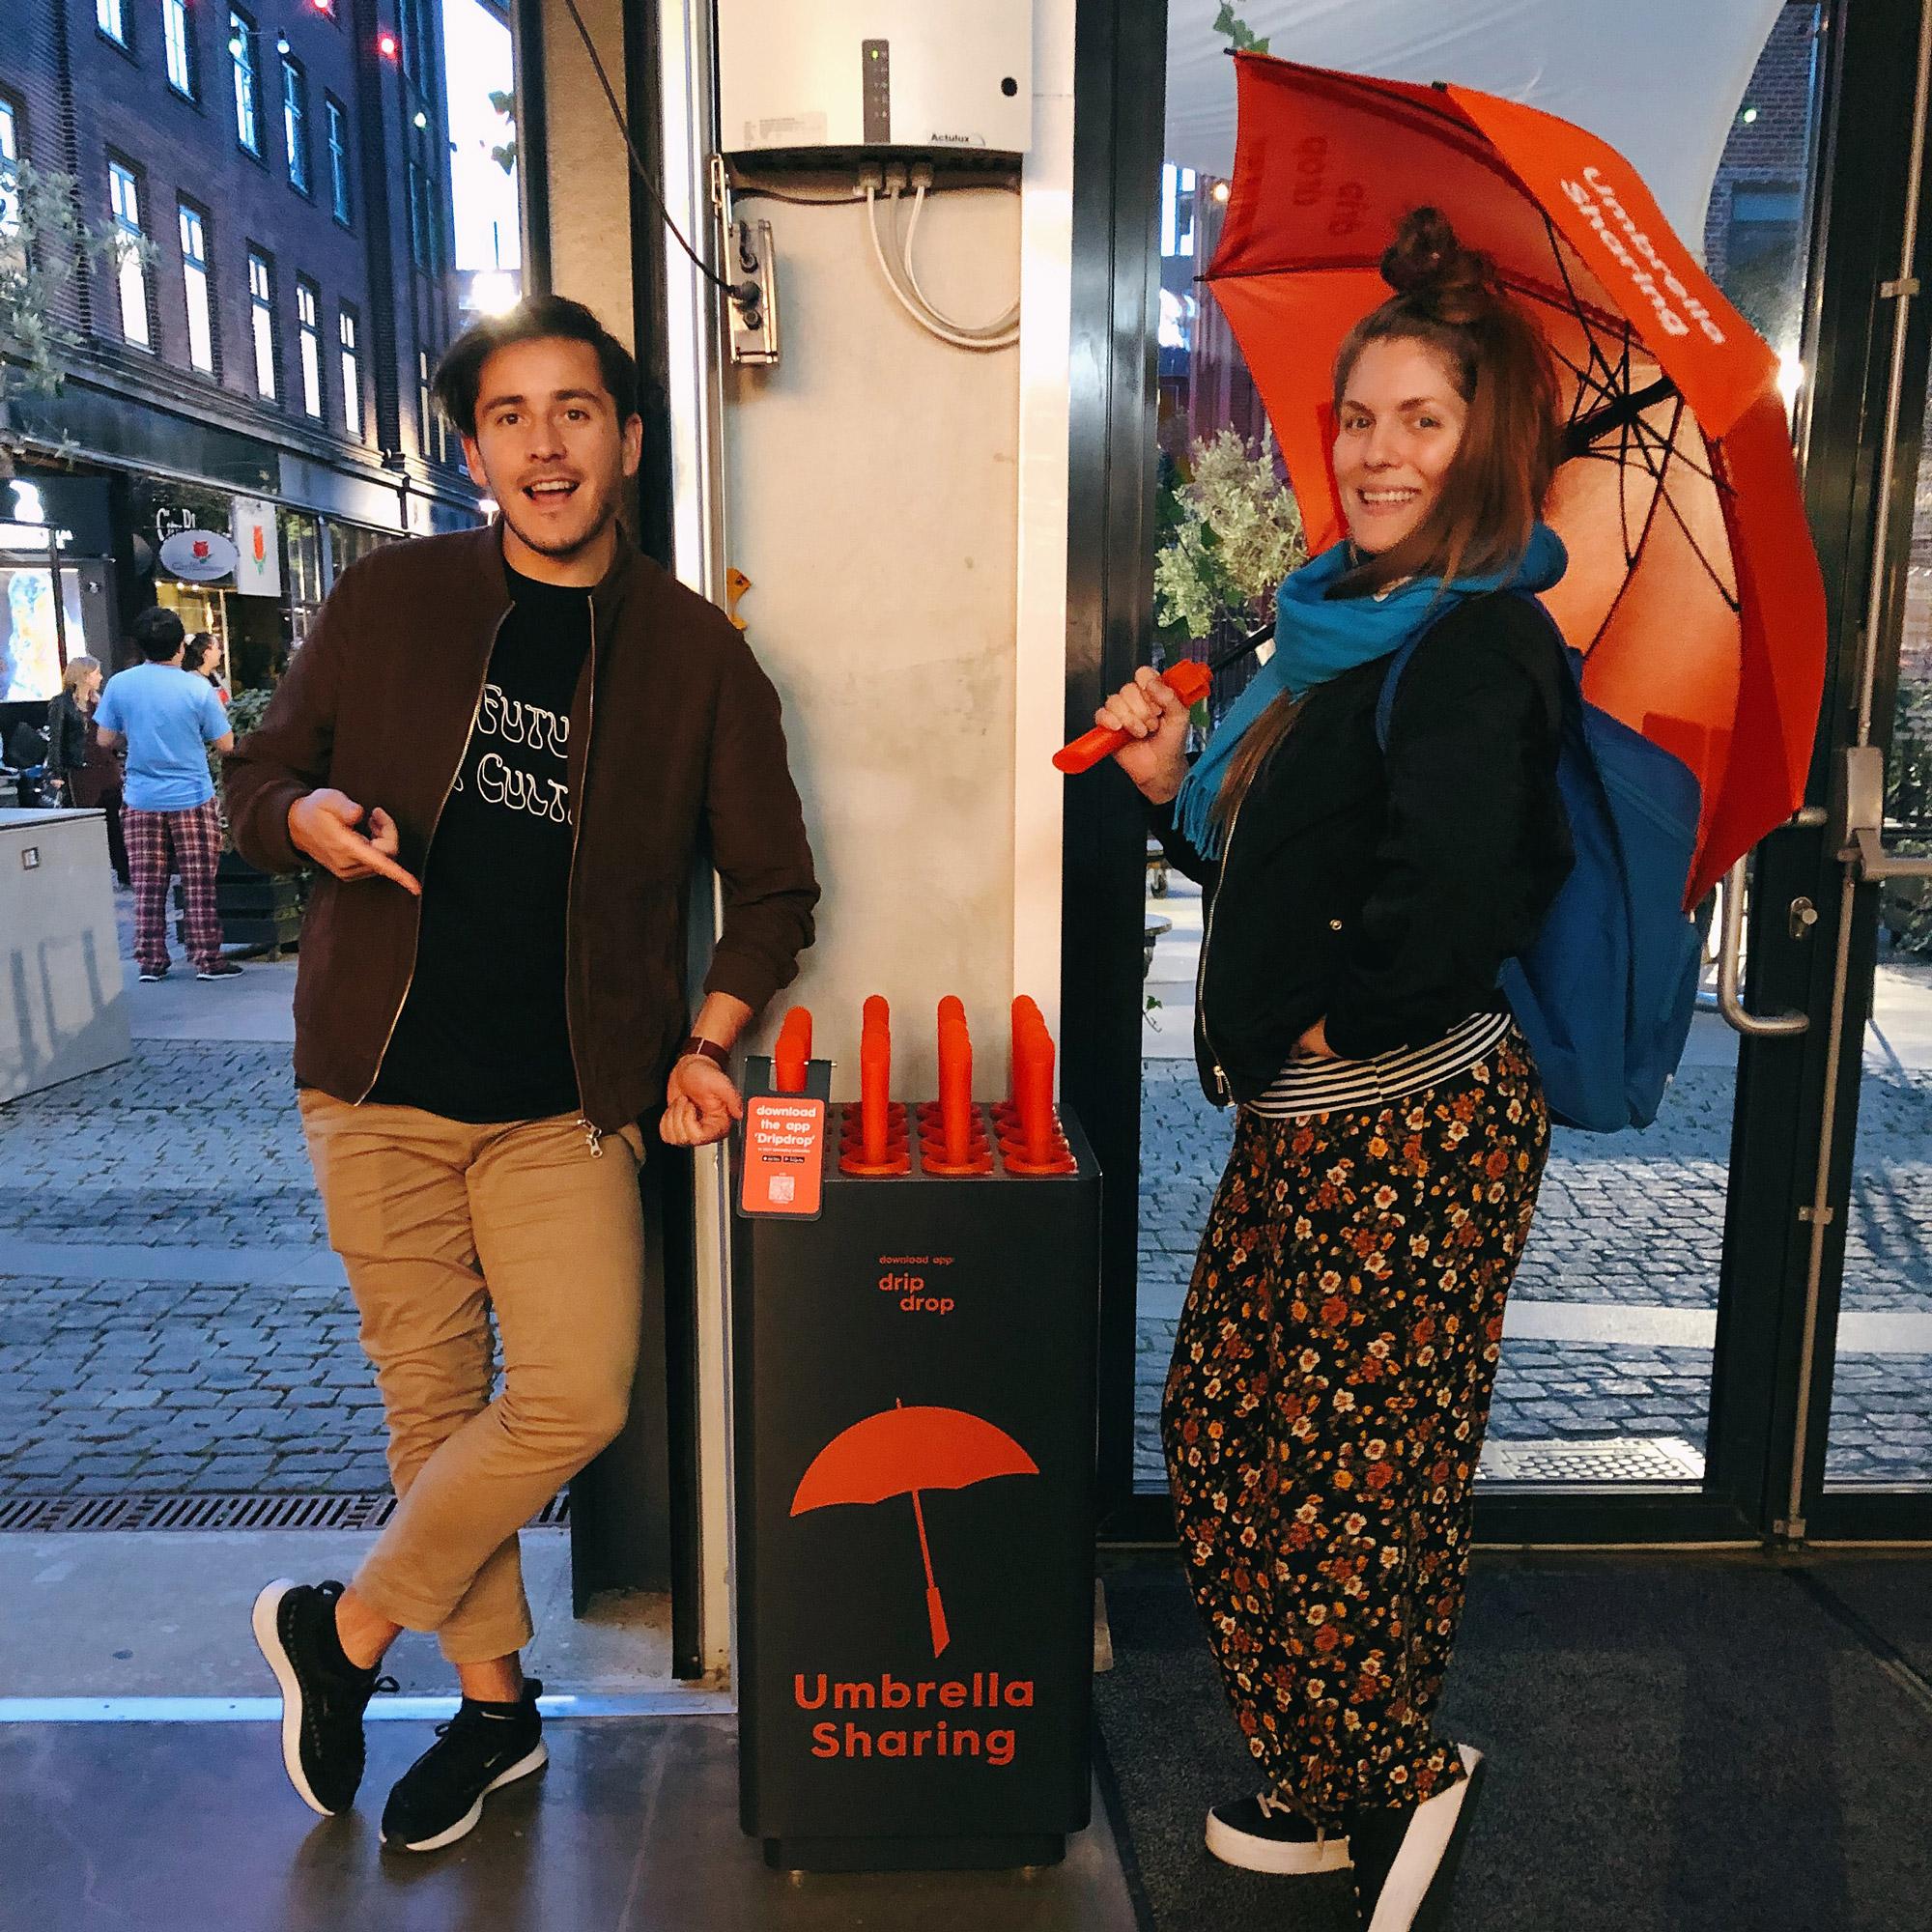 Dripdrop Umbrella Sharing - Aarhus location